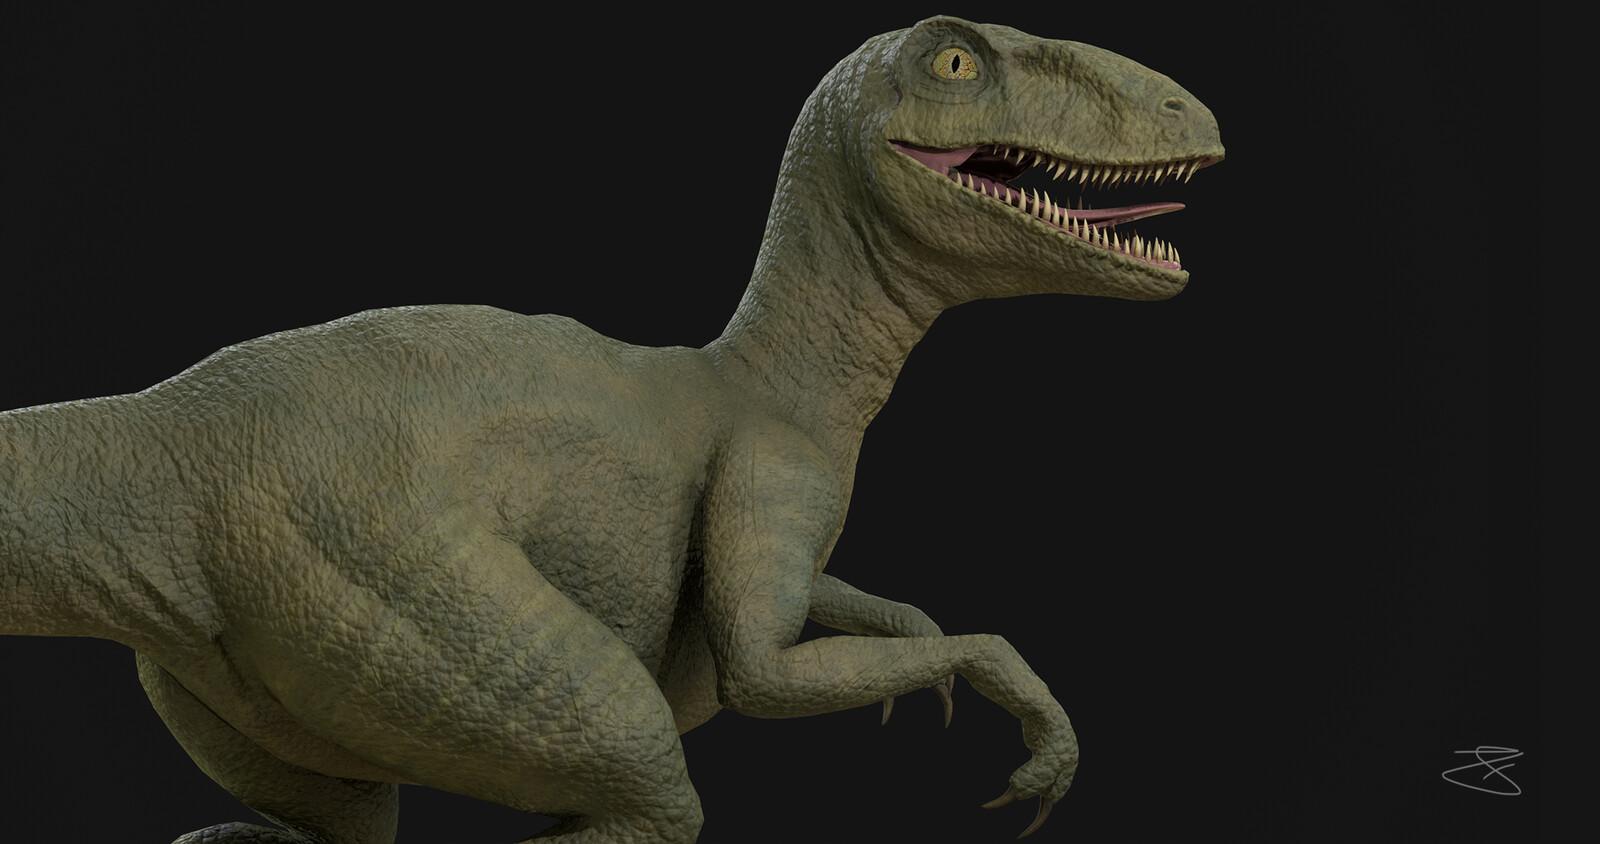 Betsy, The Velociraptor